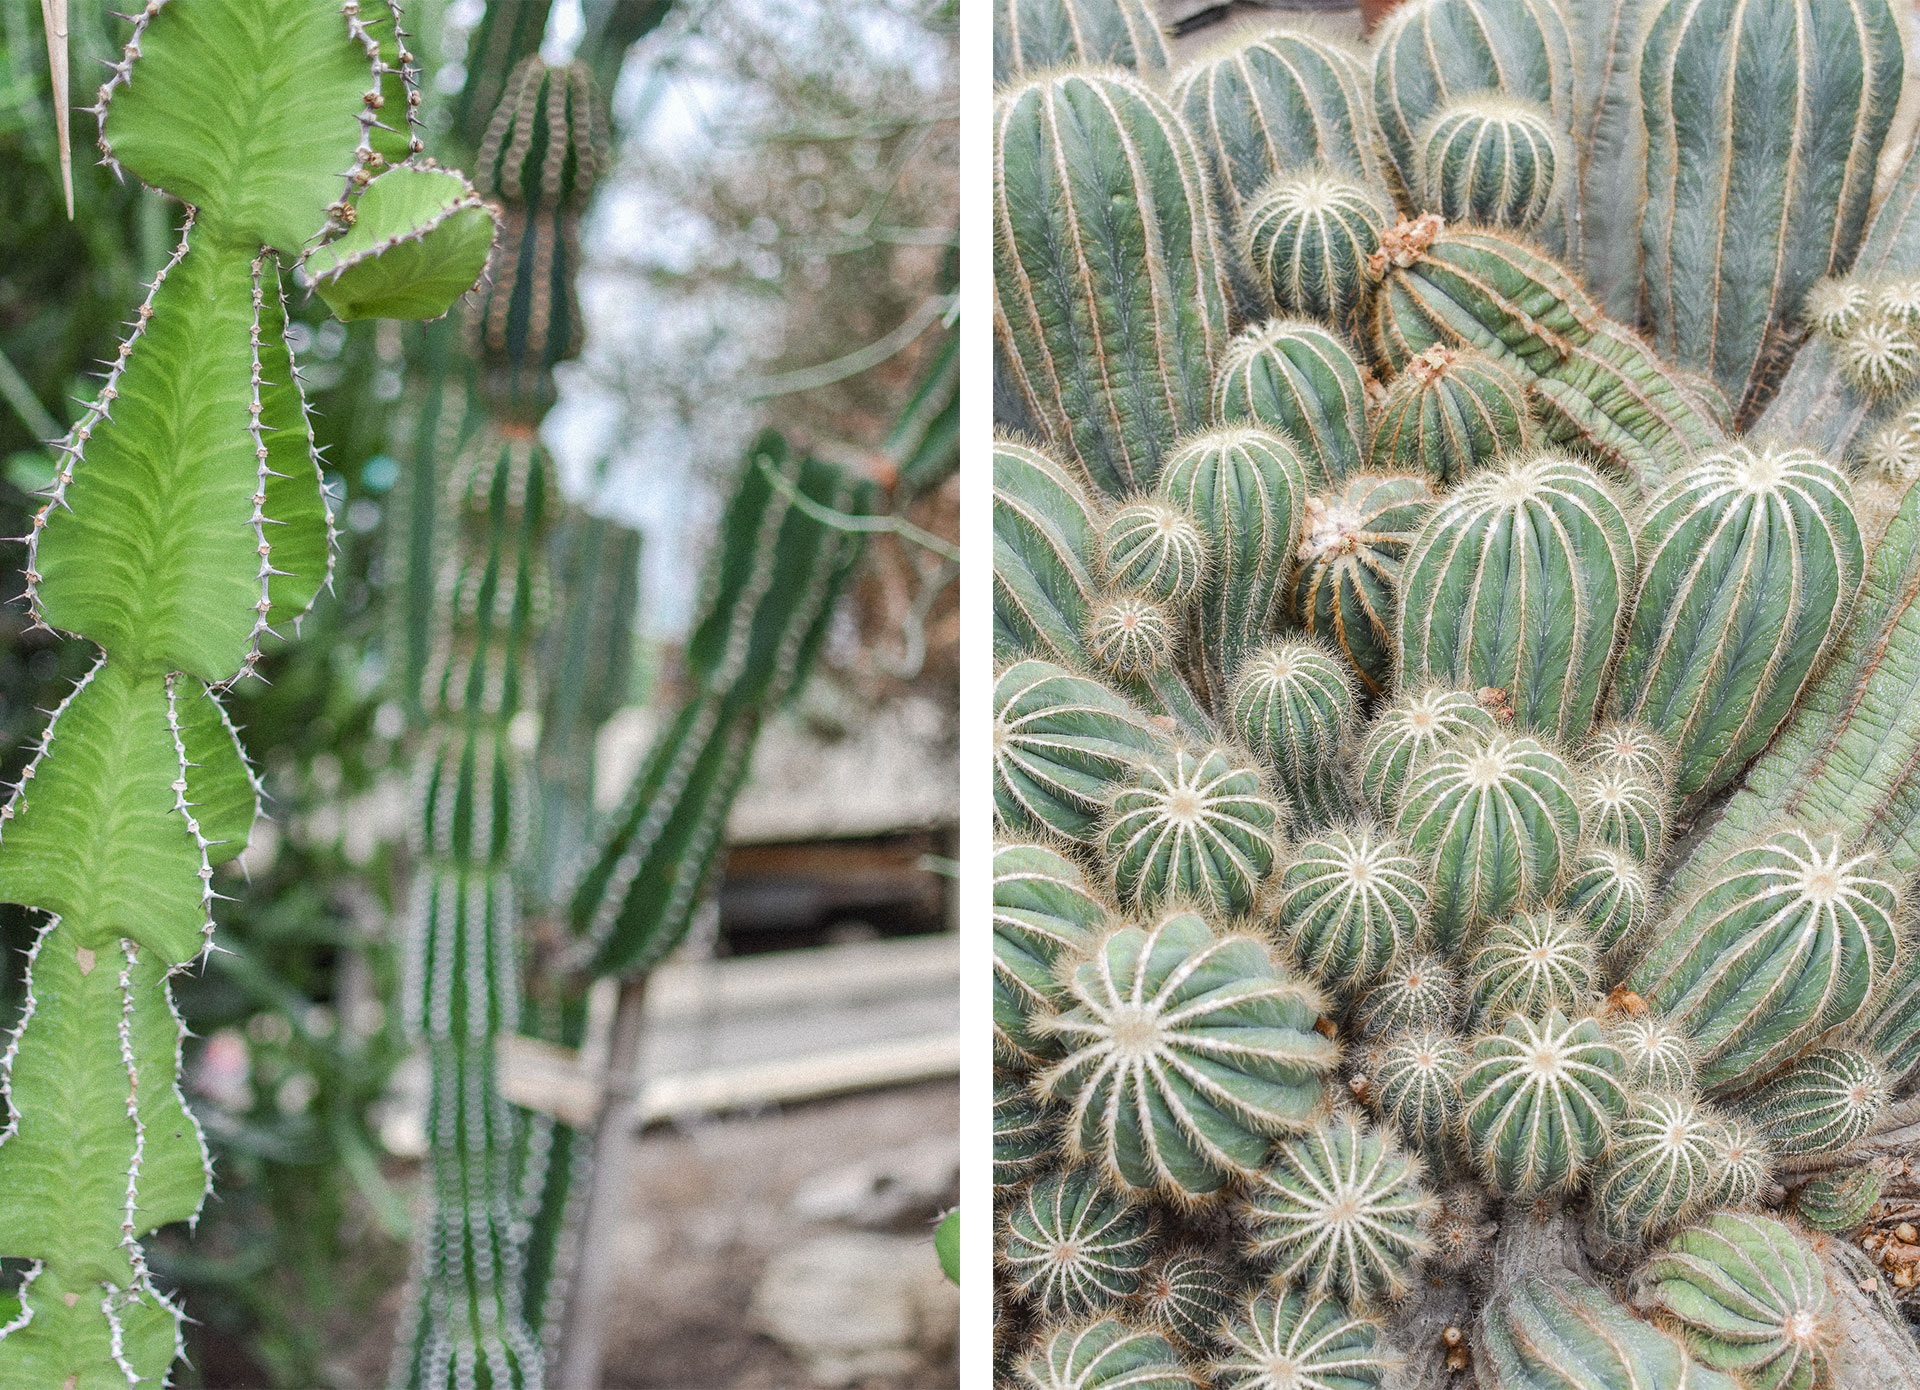 jardin serres auteuil paris cactus tropical